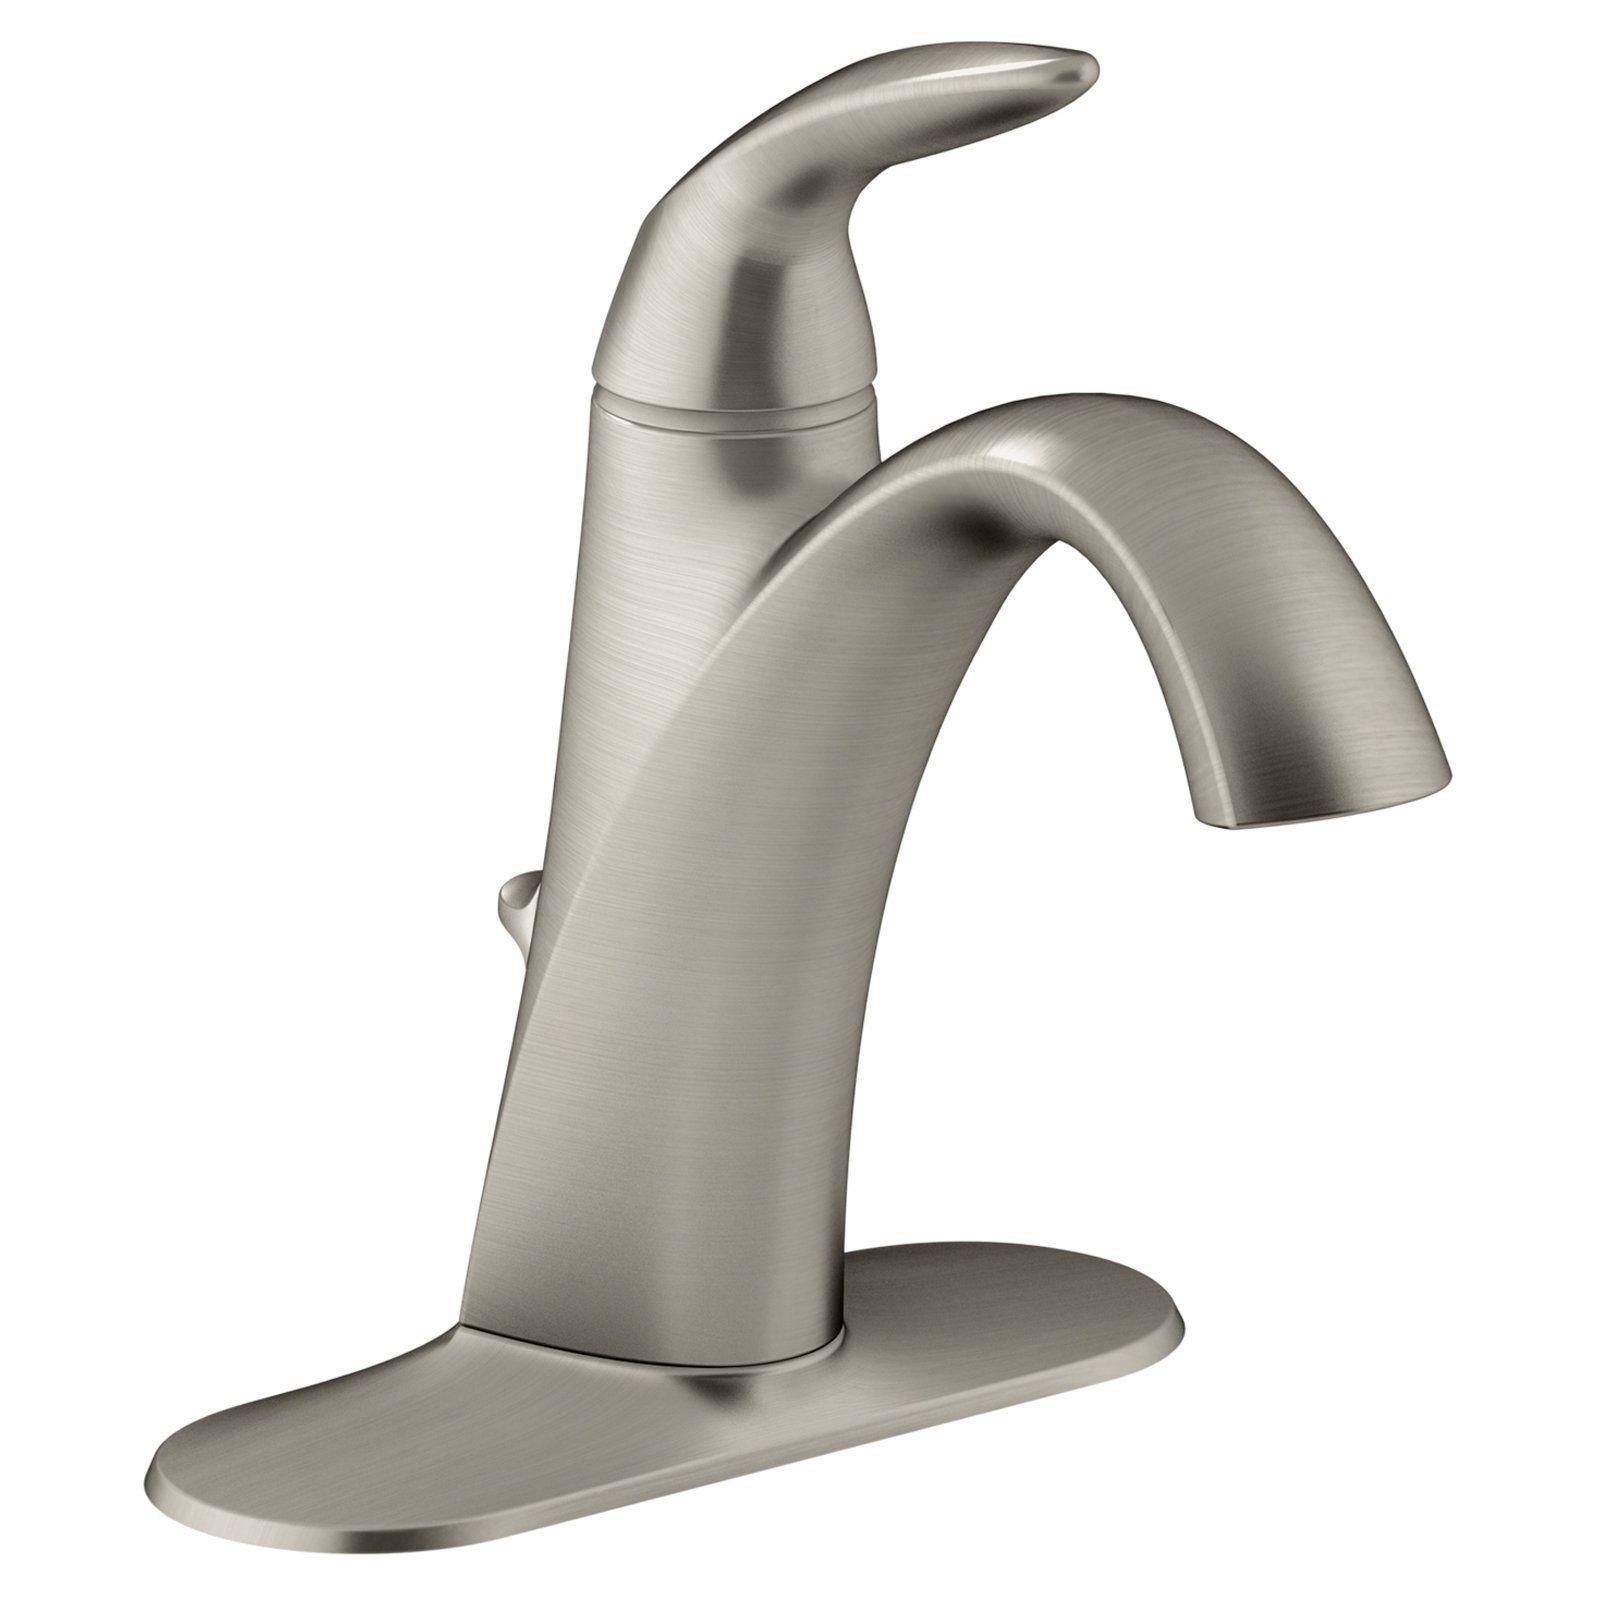 Kohler Alteo Single Handle Bathroom Sink Faucet Single Handle